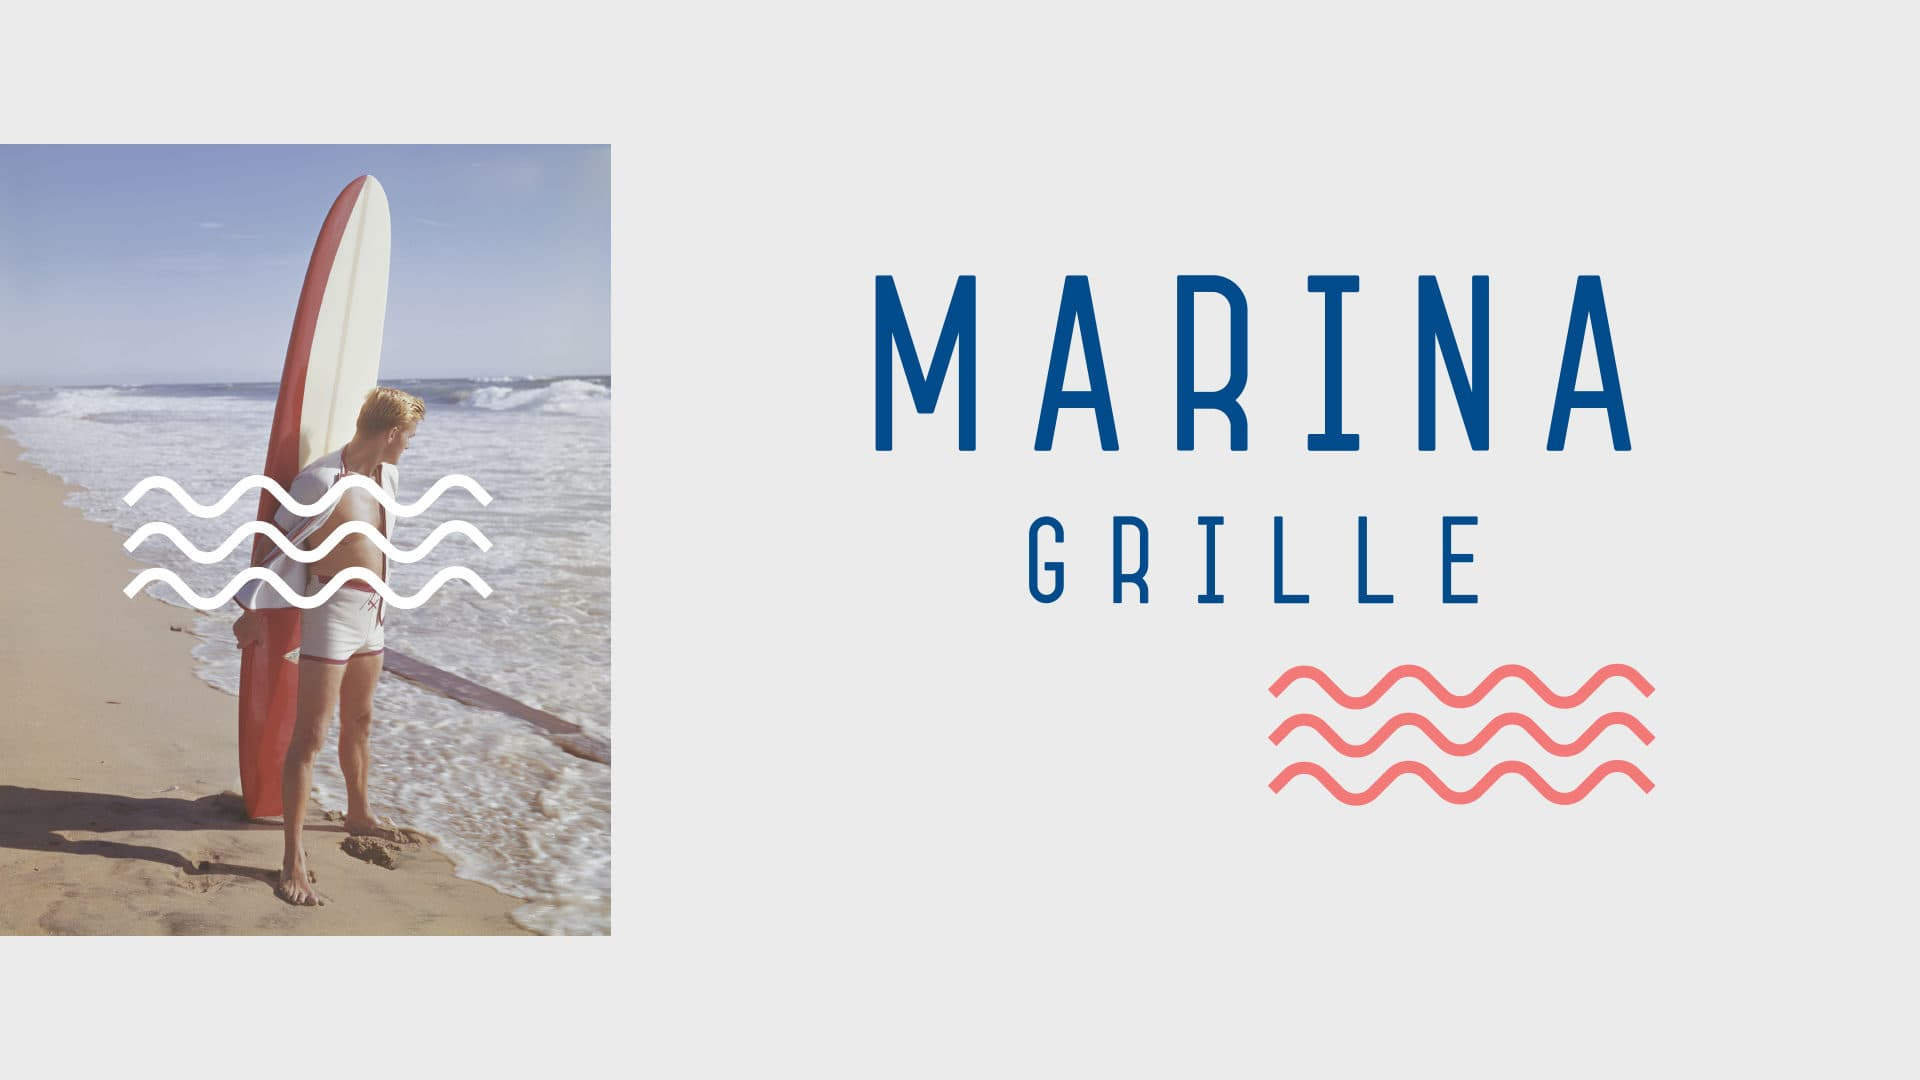 Marina Grille Brand Development